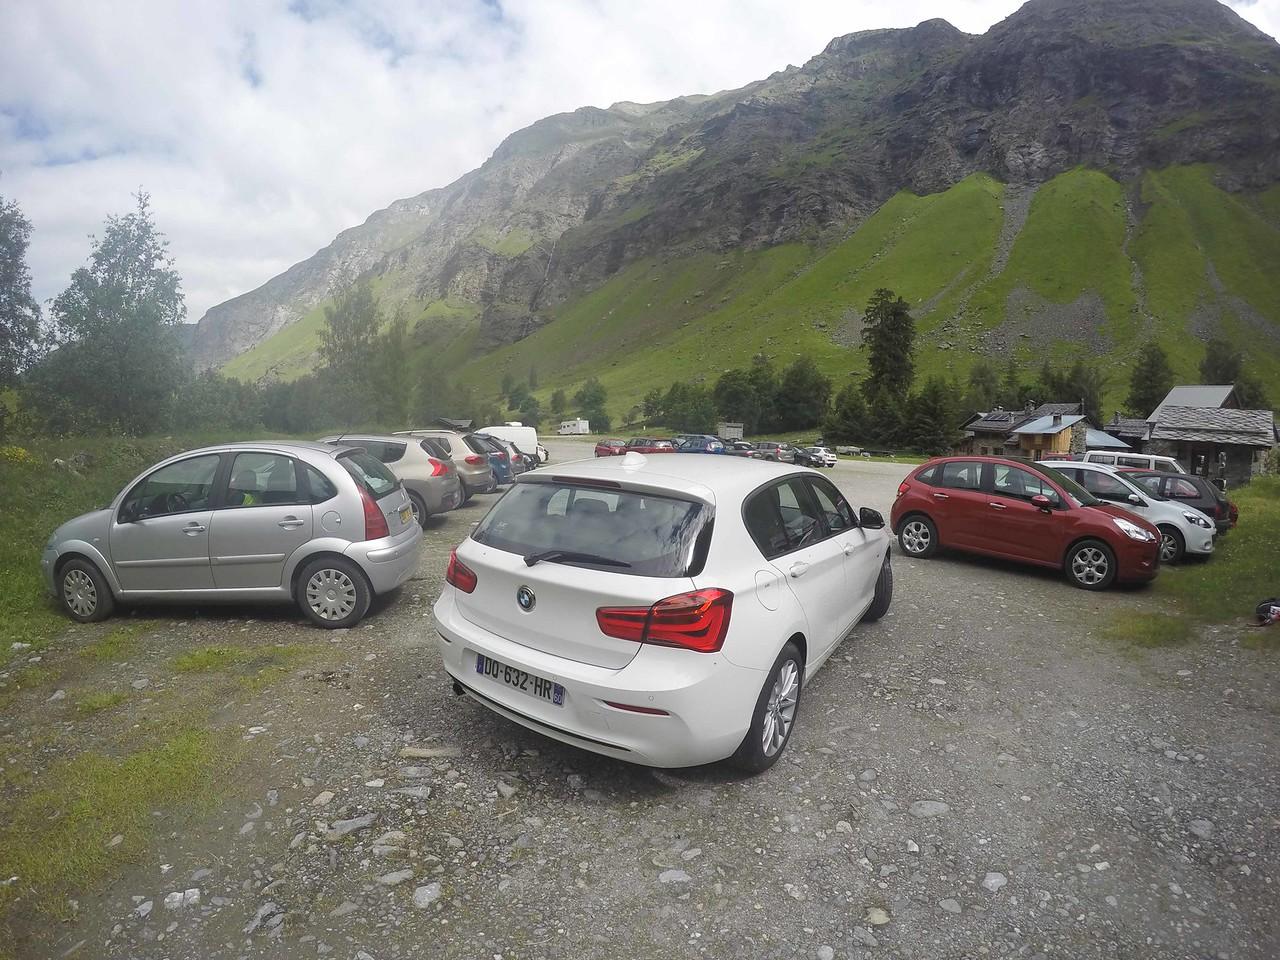 Saddling up the rental for a trip to Chamonix!<br /> <br /> DCIM\100GOPRO\GOPR5958., hlbD_abc72555.jpg